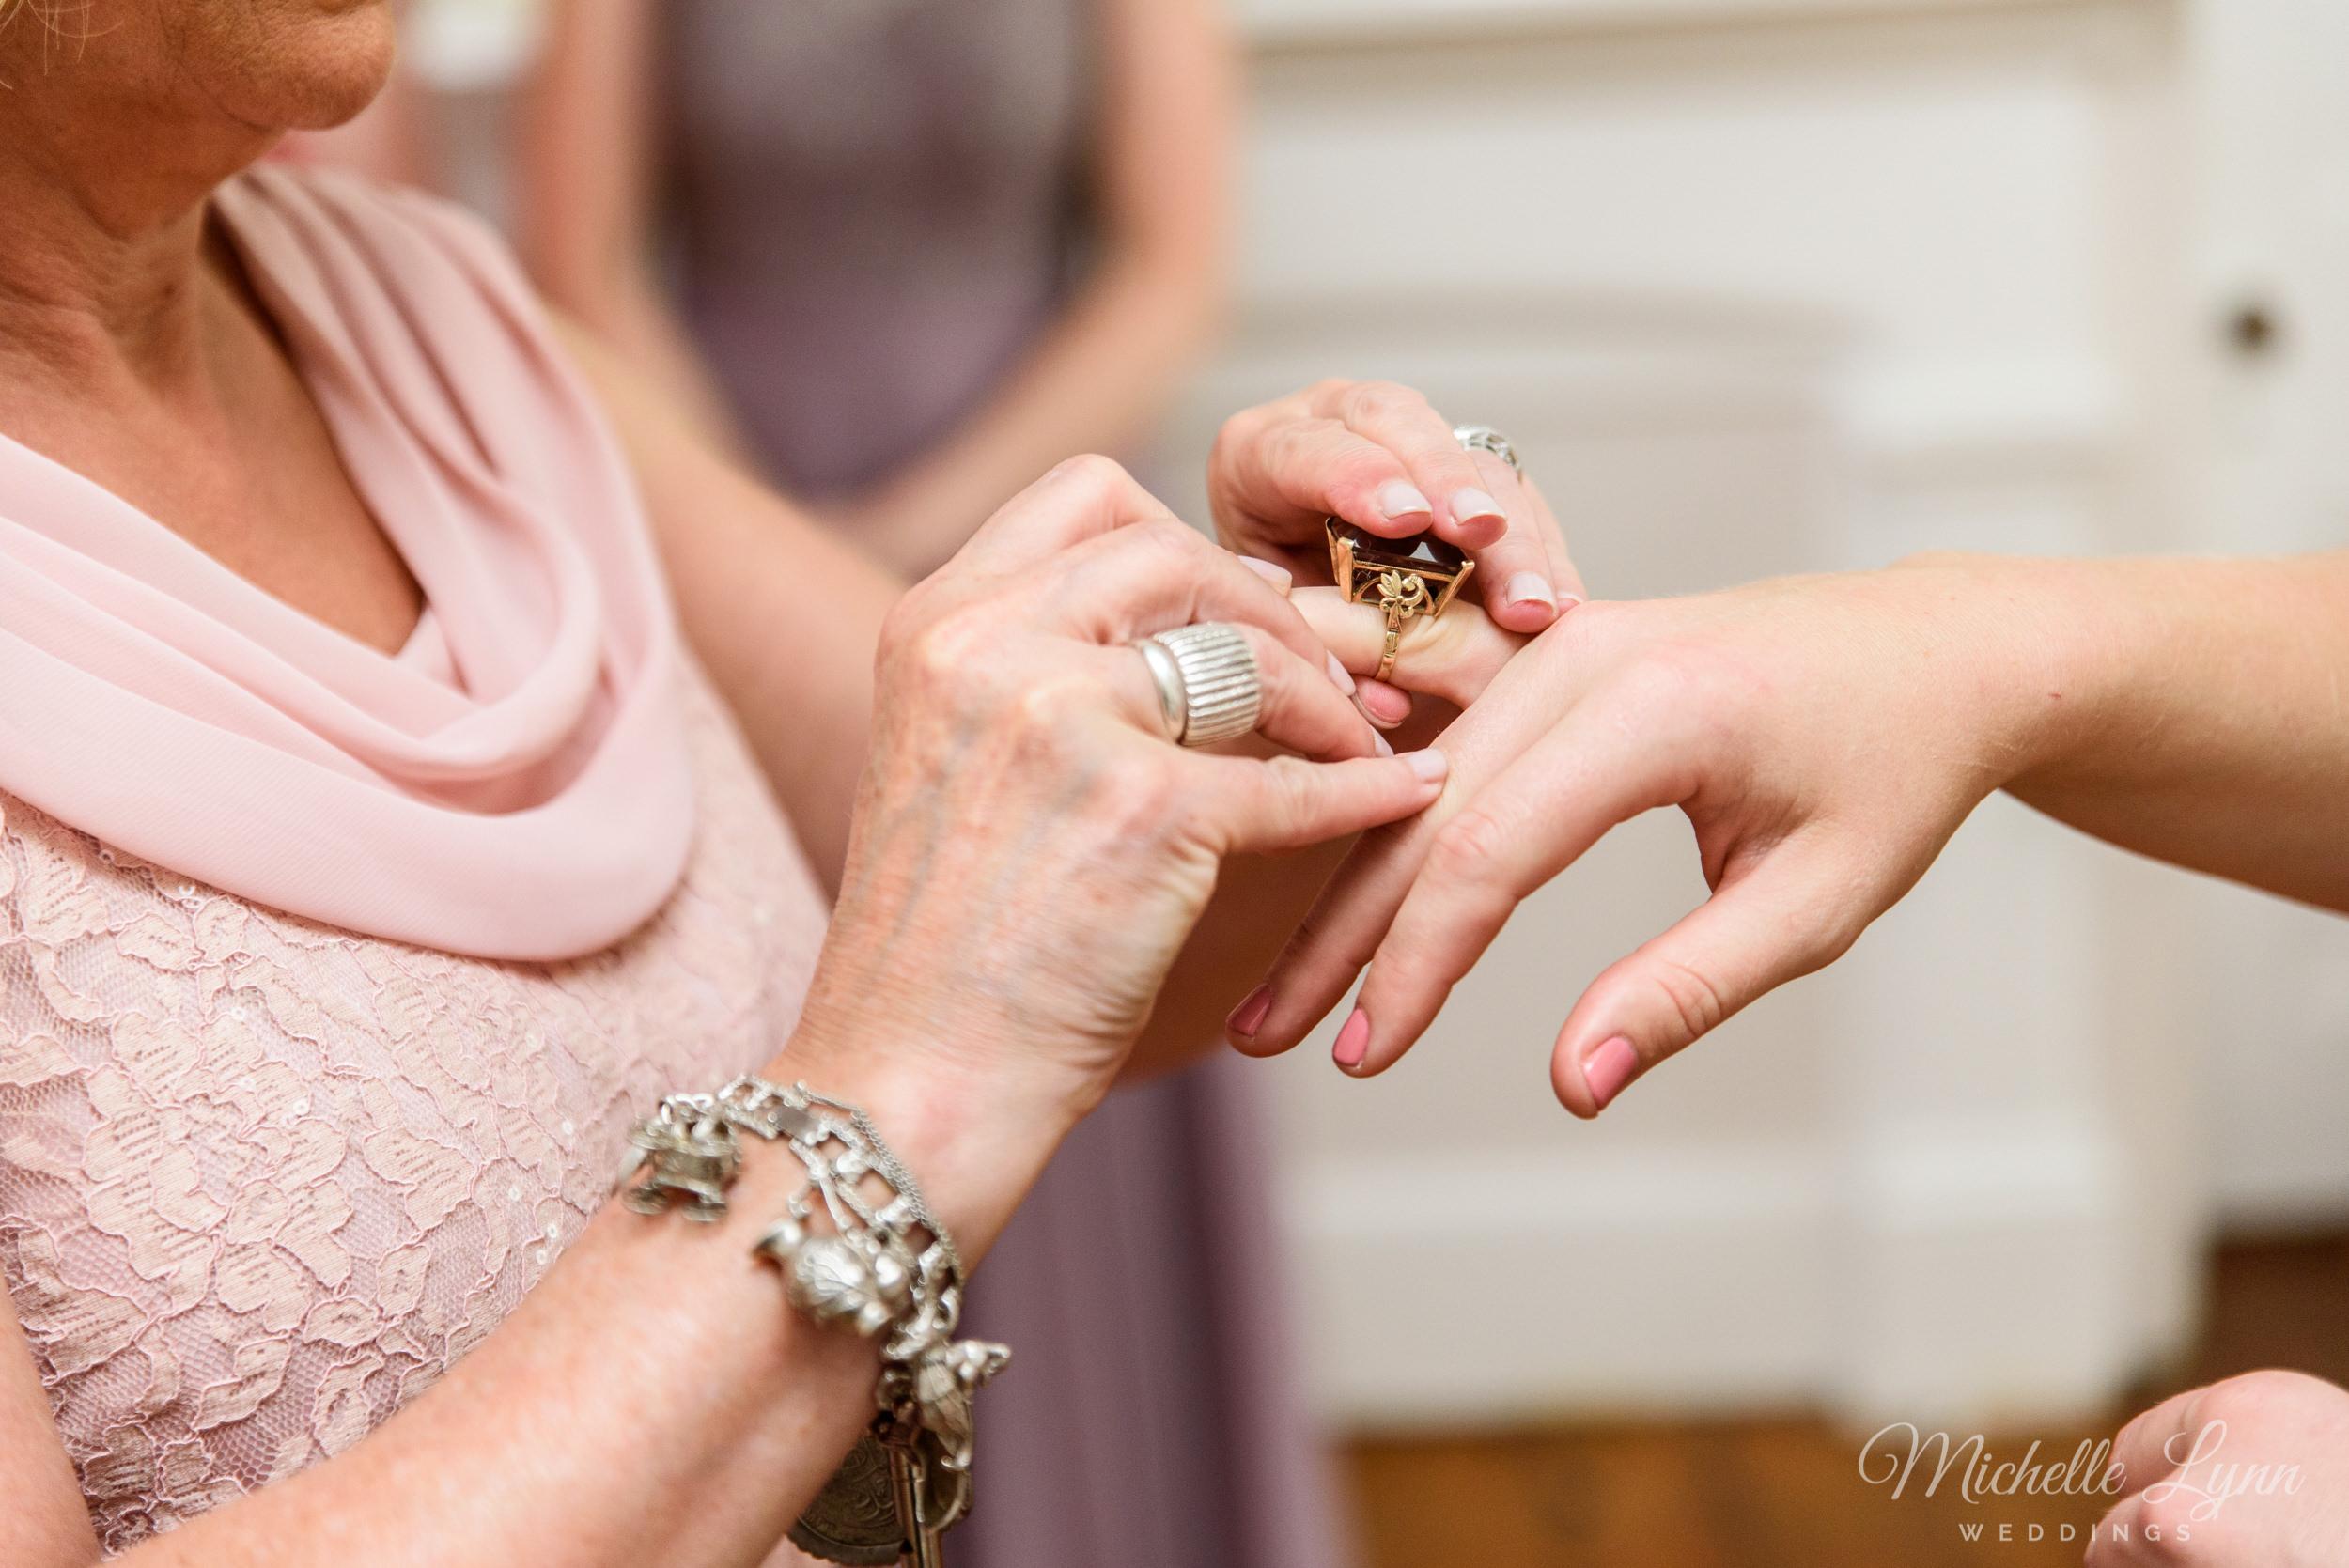 mlw-unionville-vineyards-nj-wedding-photography-15.jpg